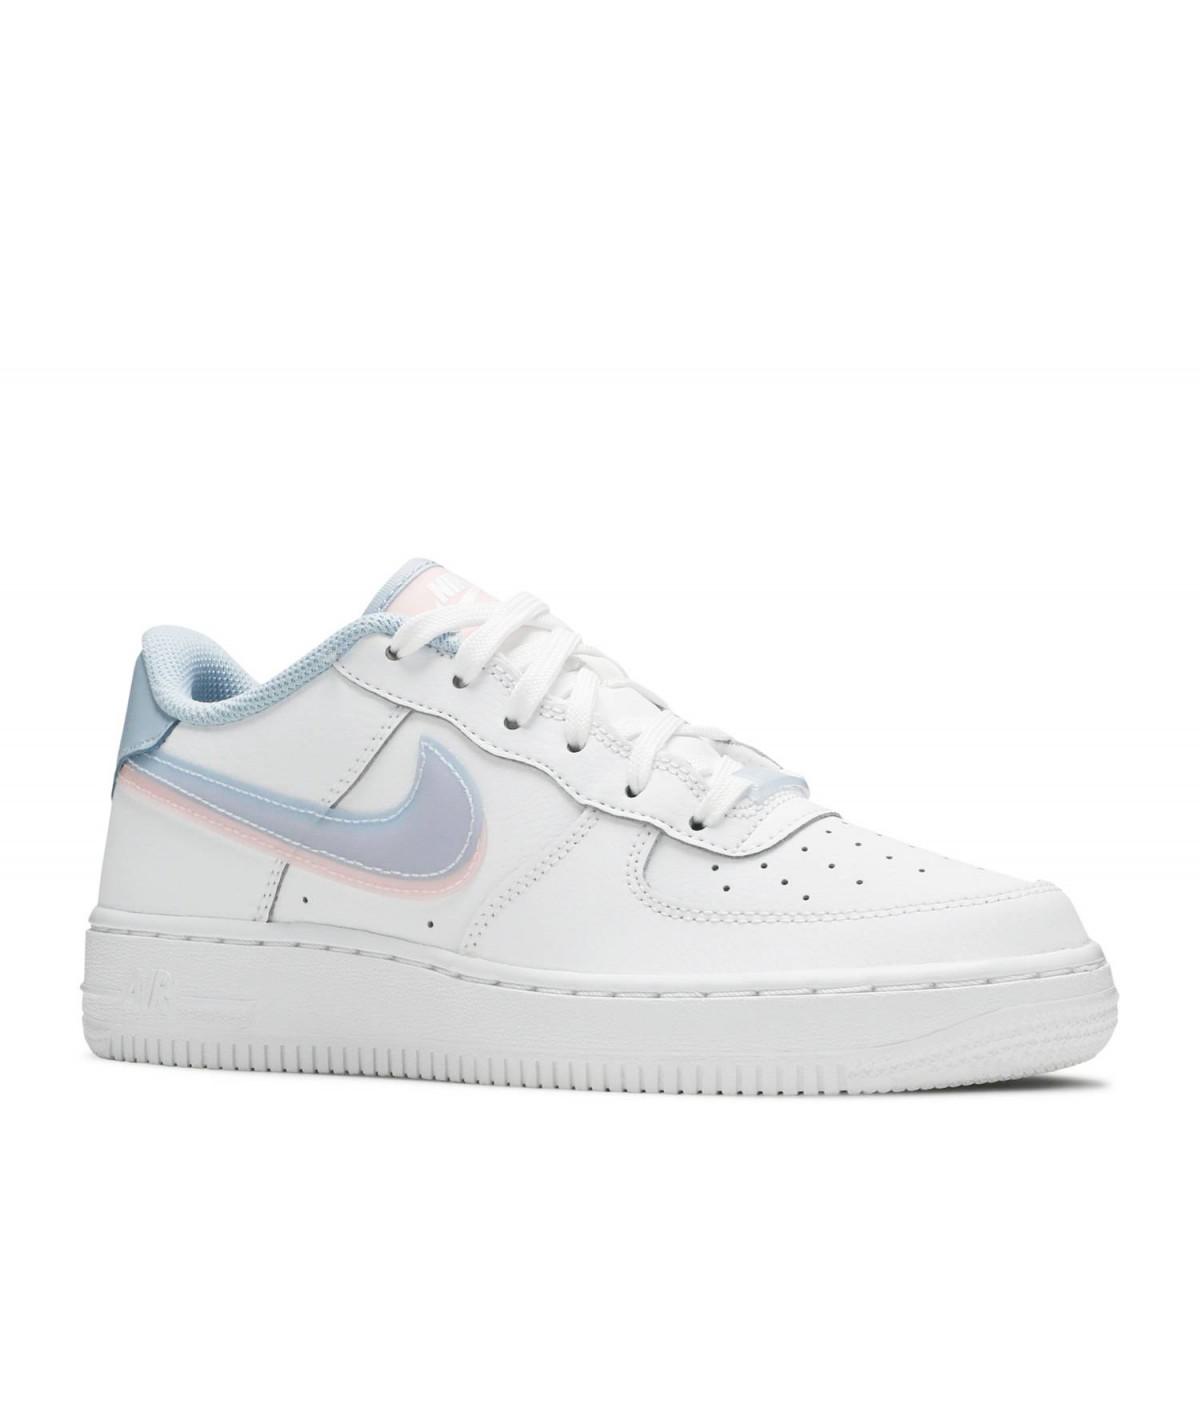 Nike Air Force 1 LV8 Gs 'Pastel Swoosh'